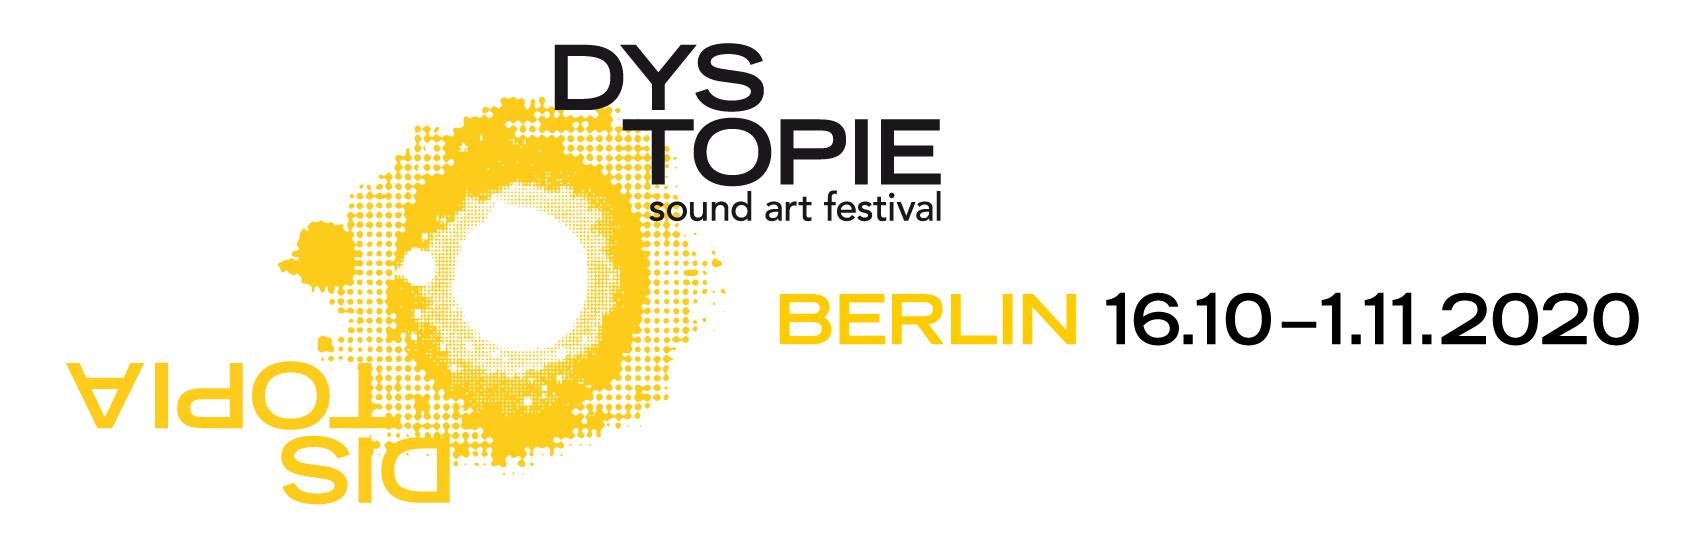 DYSTOPIE sound art festival  2020